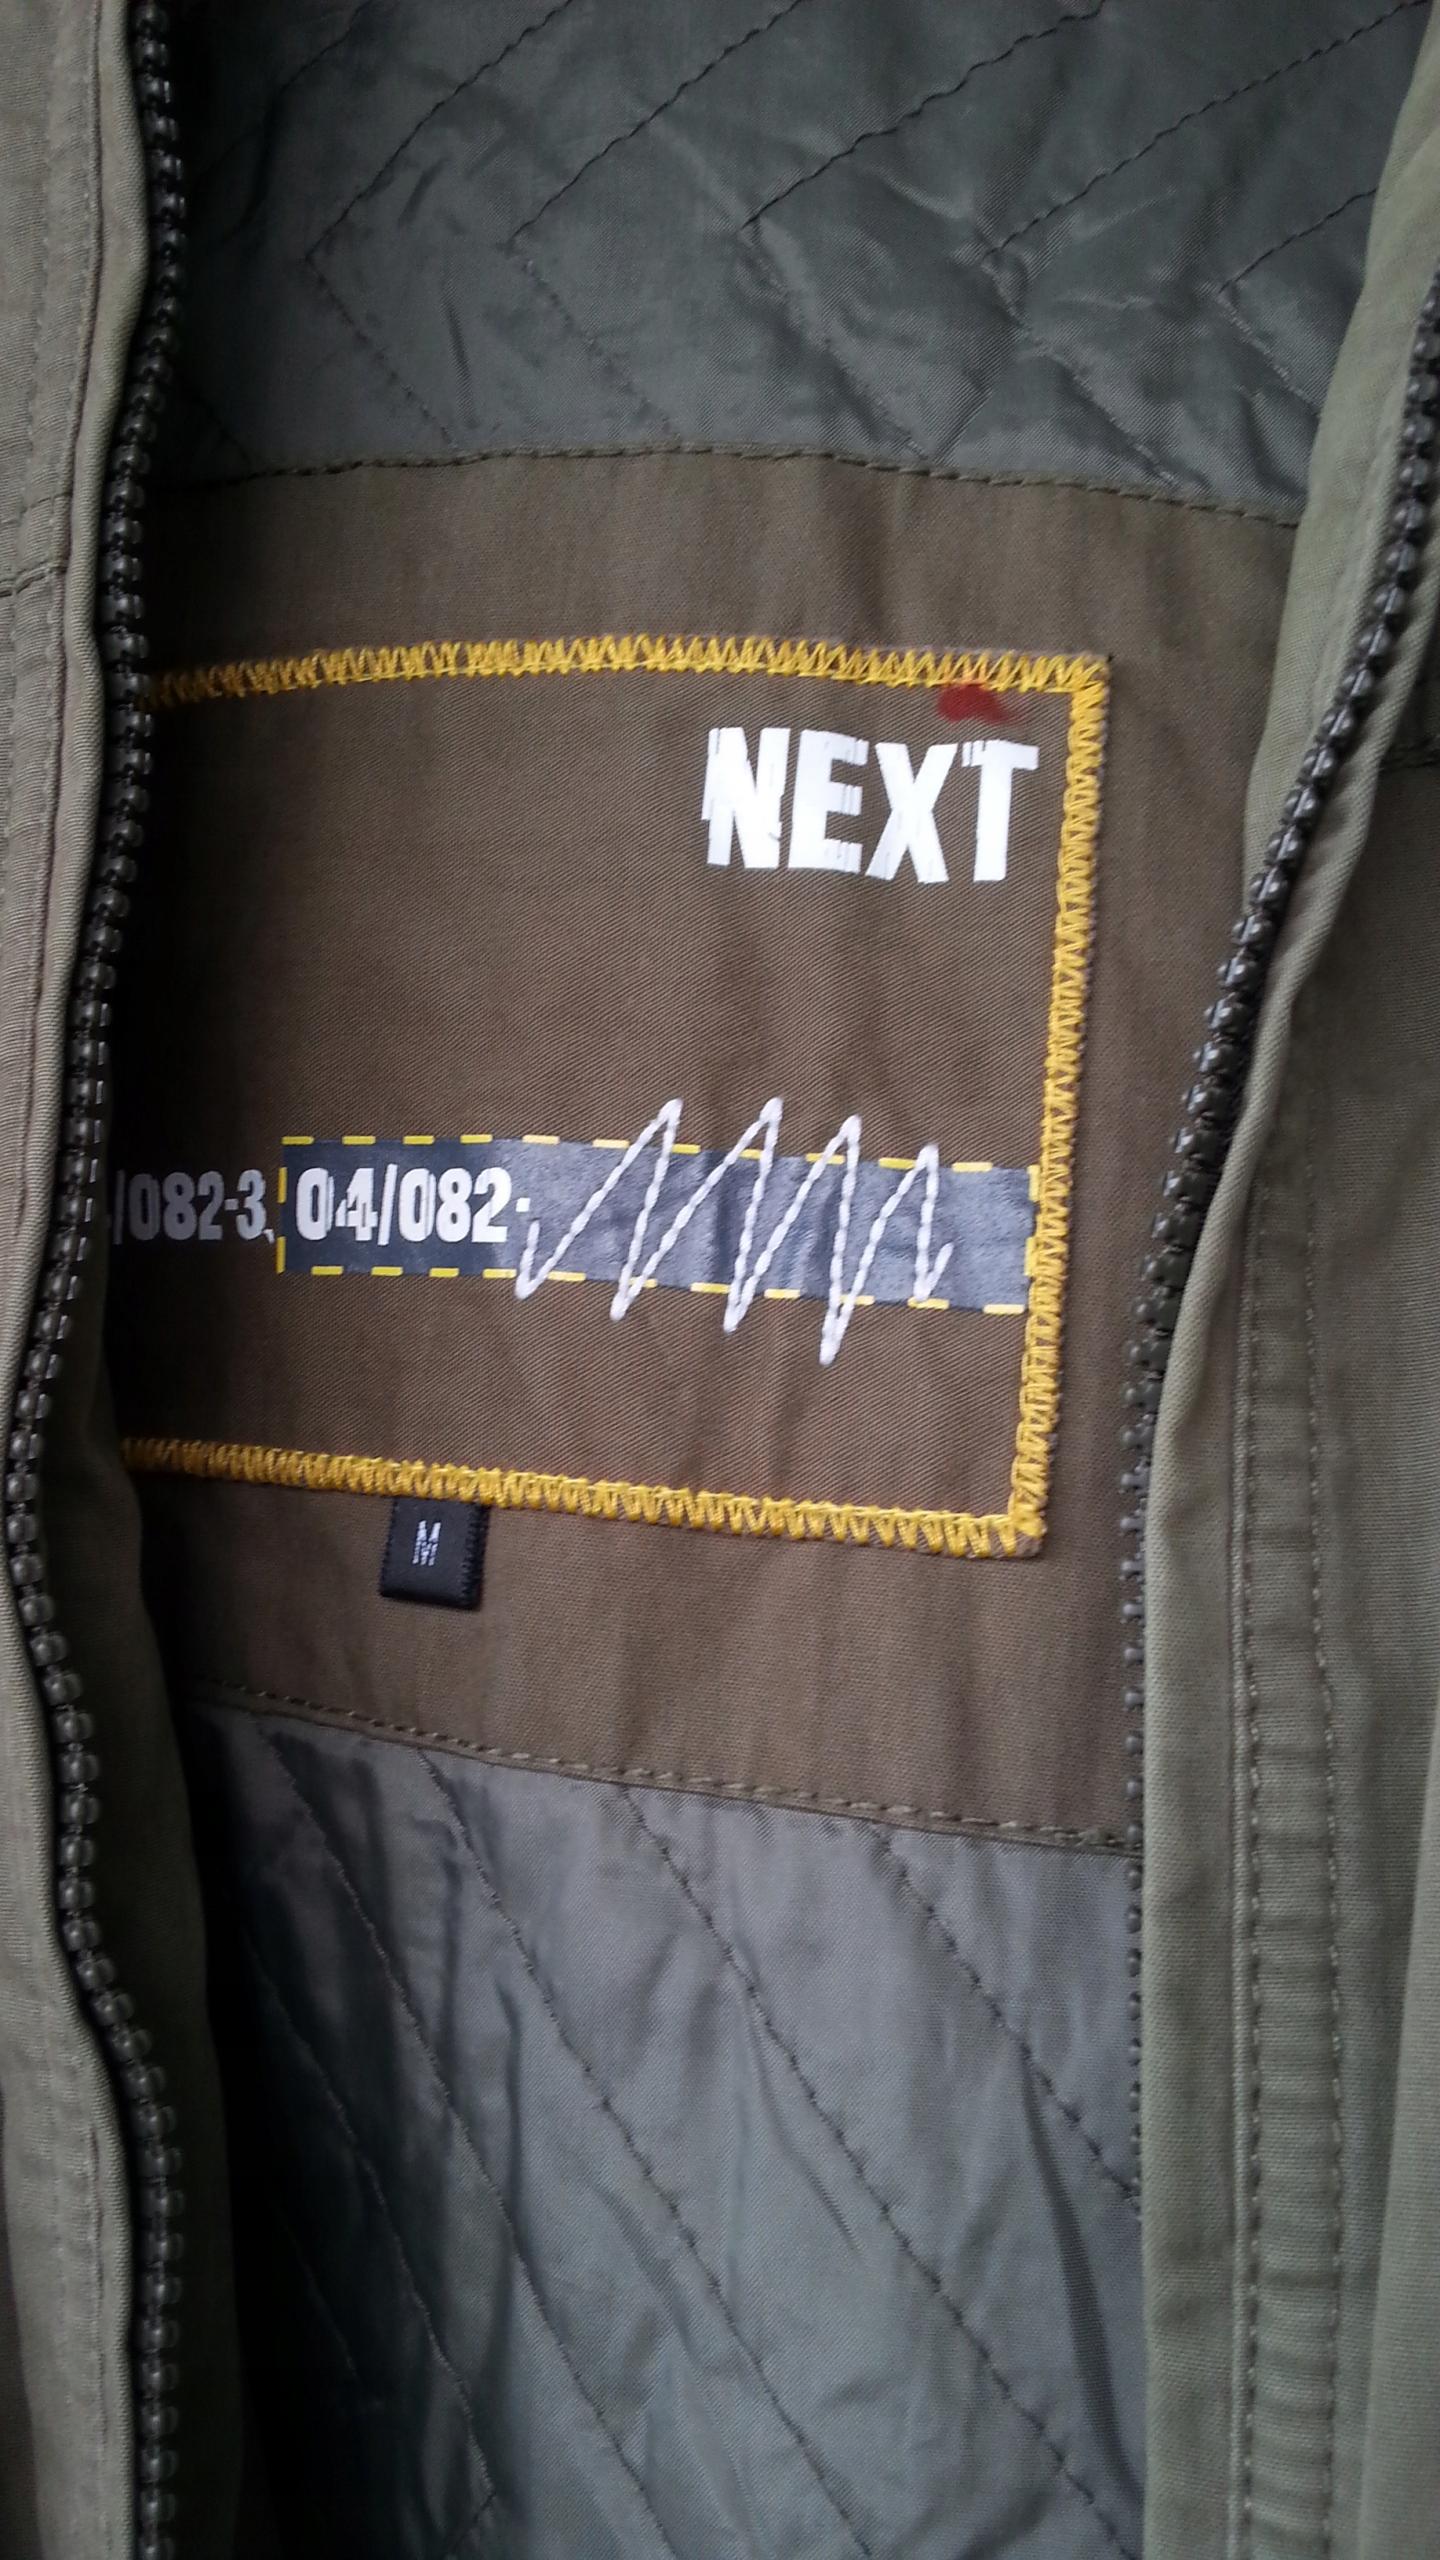 Kurtka militarna NEXT wiosenno-jesienna pachy 65cm